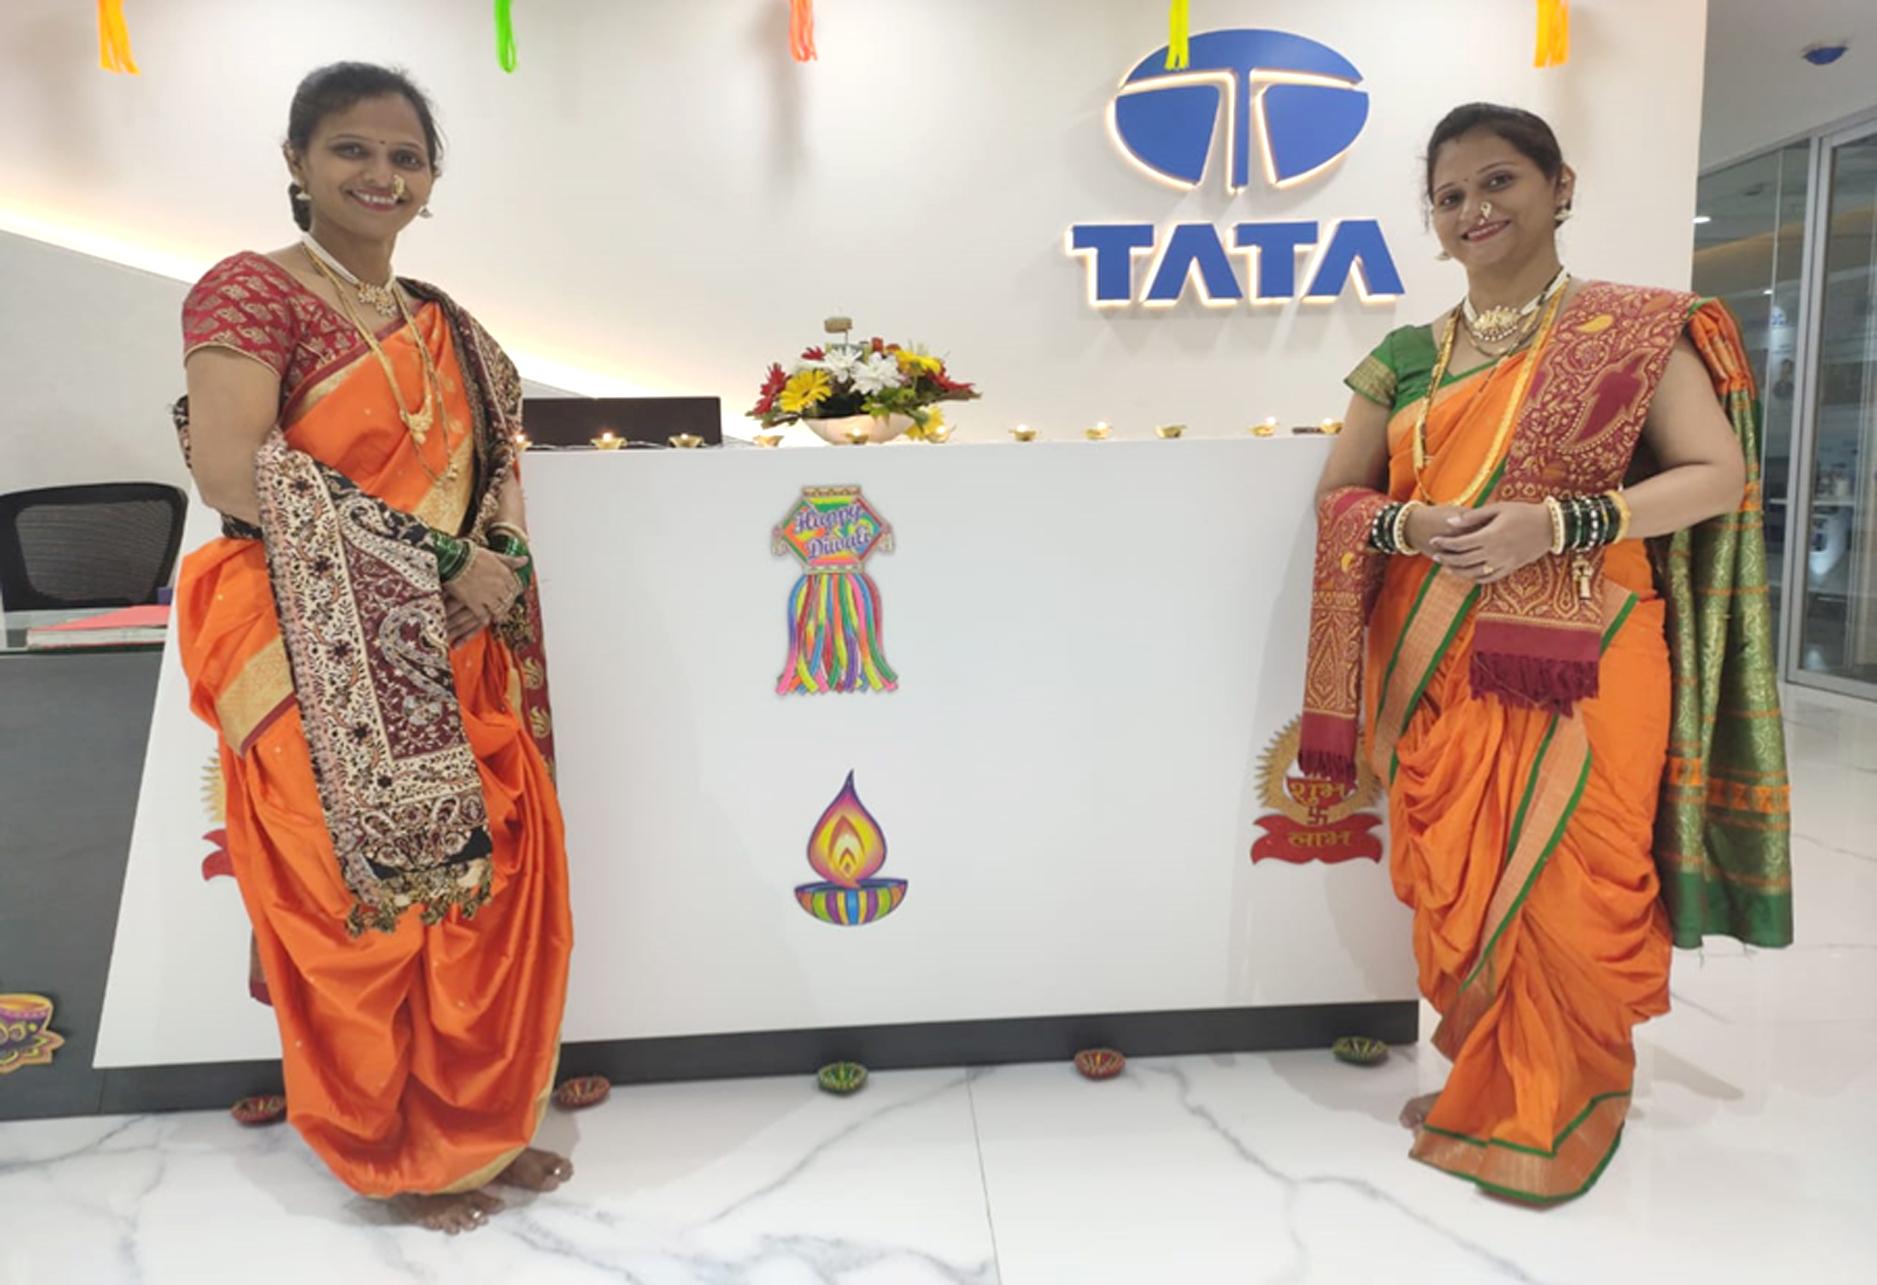 Career -diwali-best mutual funds to buy-Tata Mutual Fund